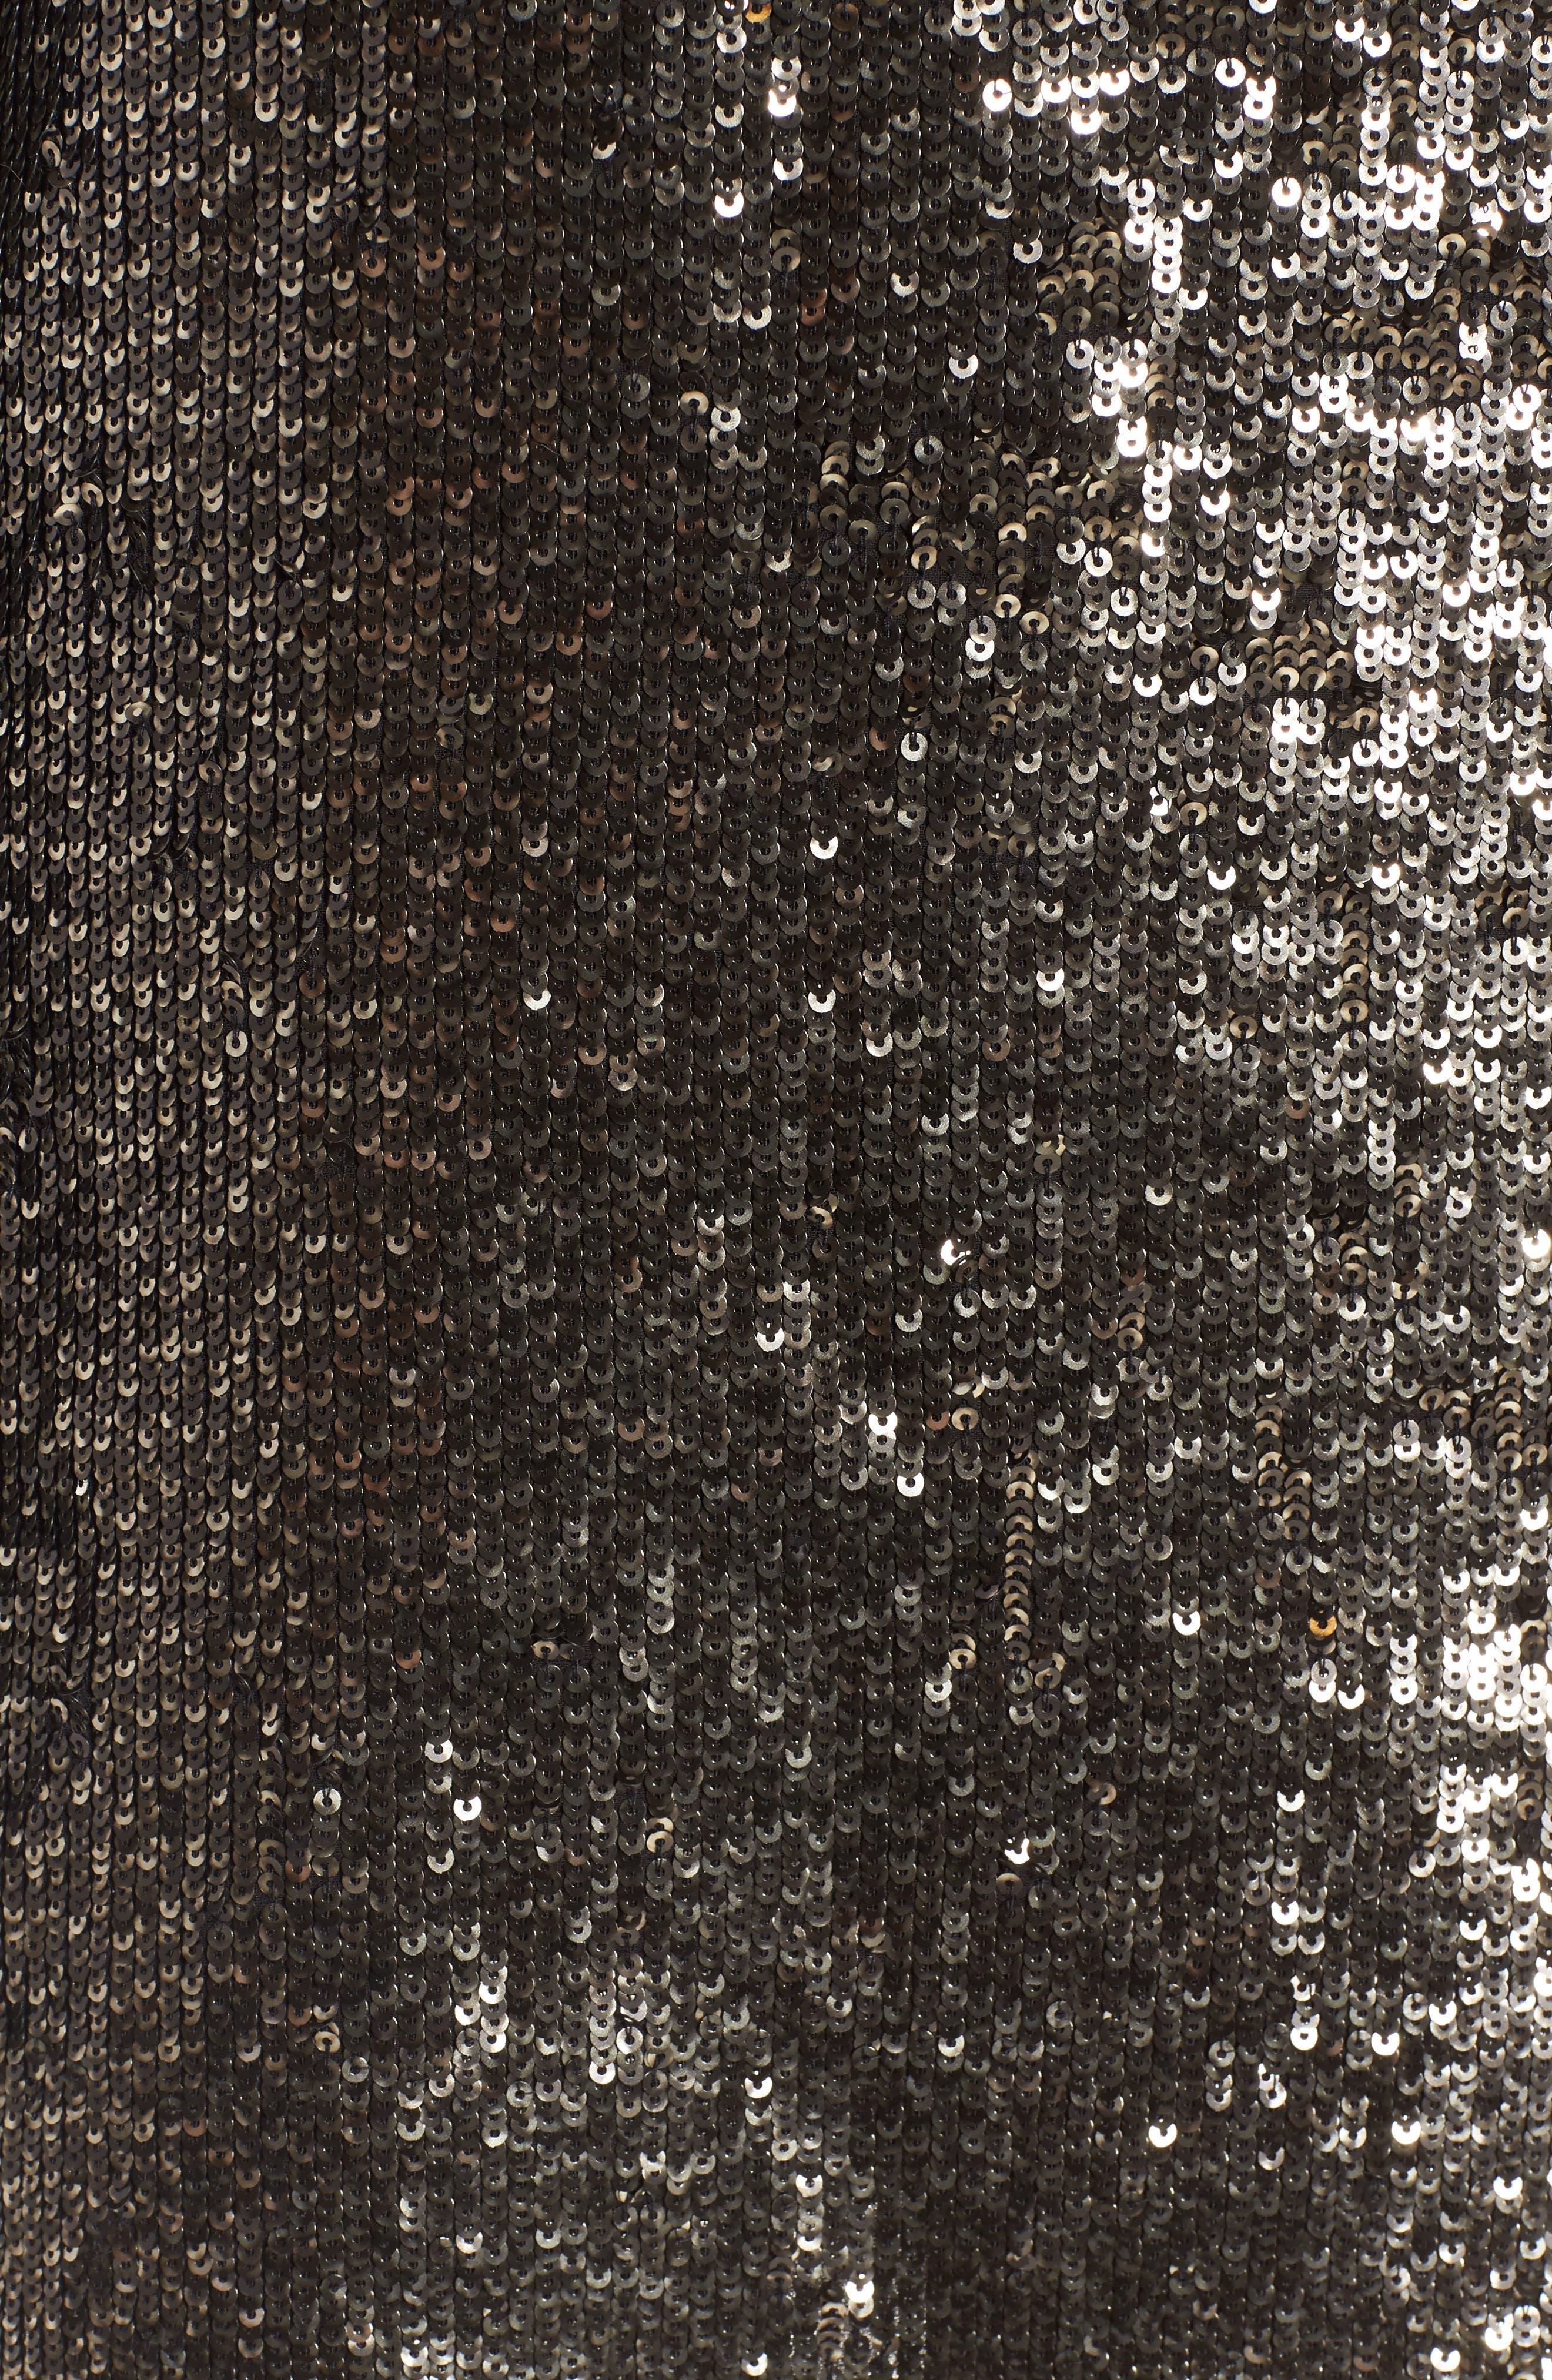 Sequin Shift Dress,                             Alternate thumbnail 5, color,                             042